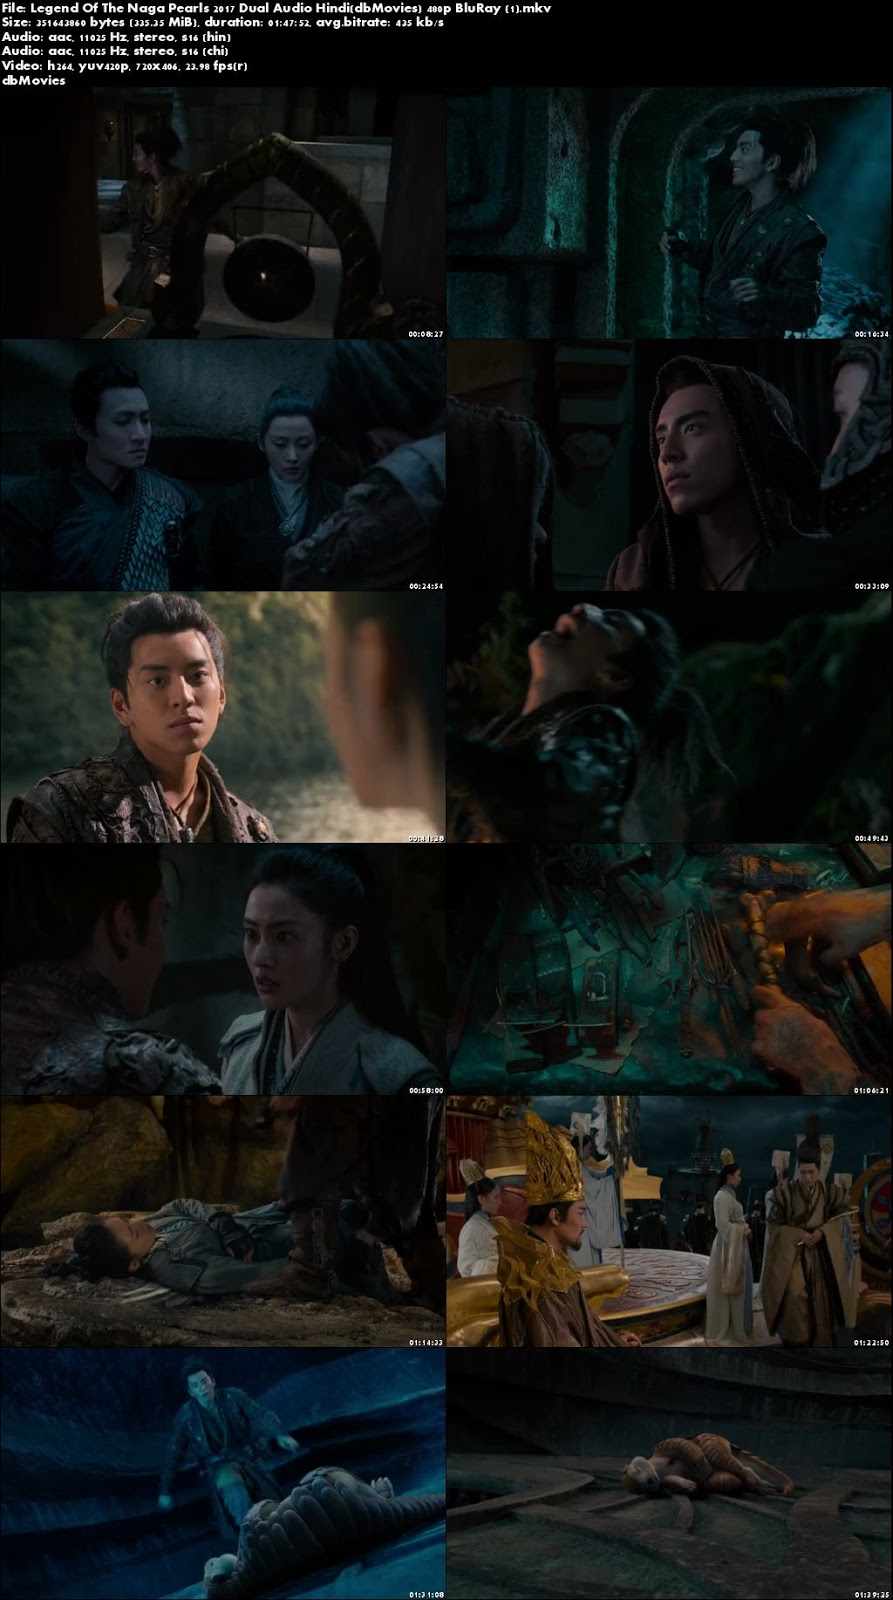 screen shot Legend of the Naga Pearls 2017 Full Movie Download Dual Audio